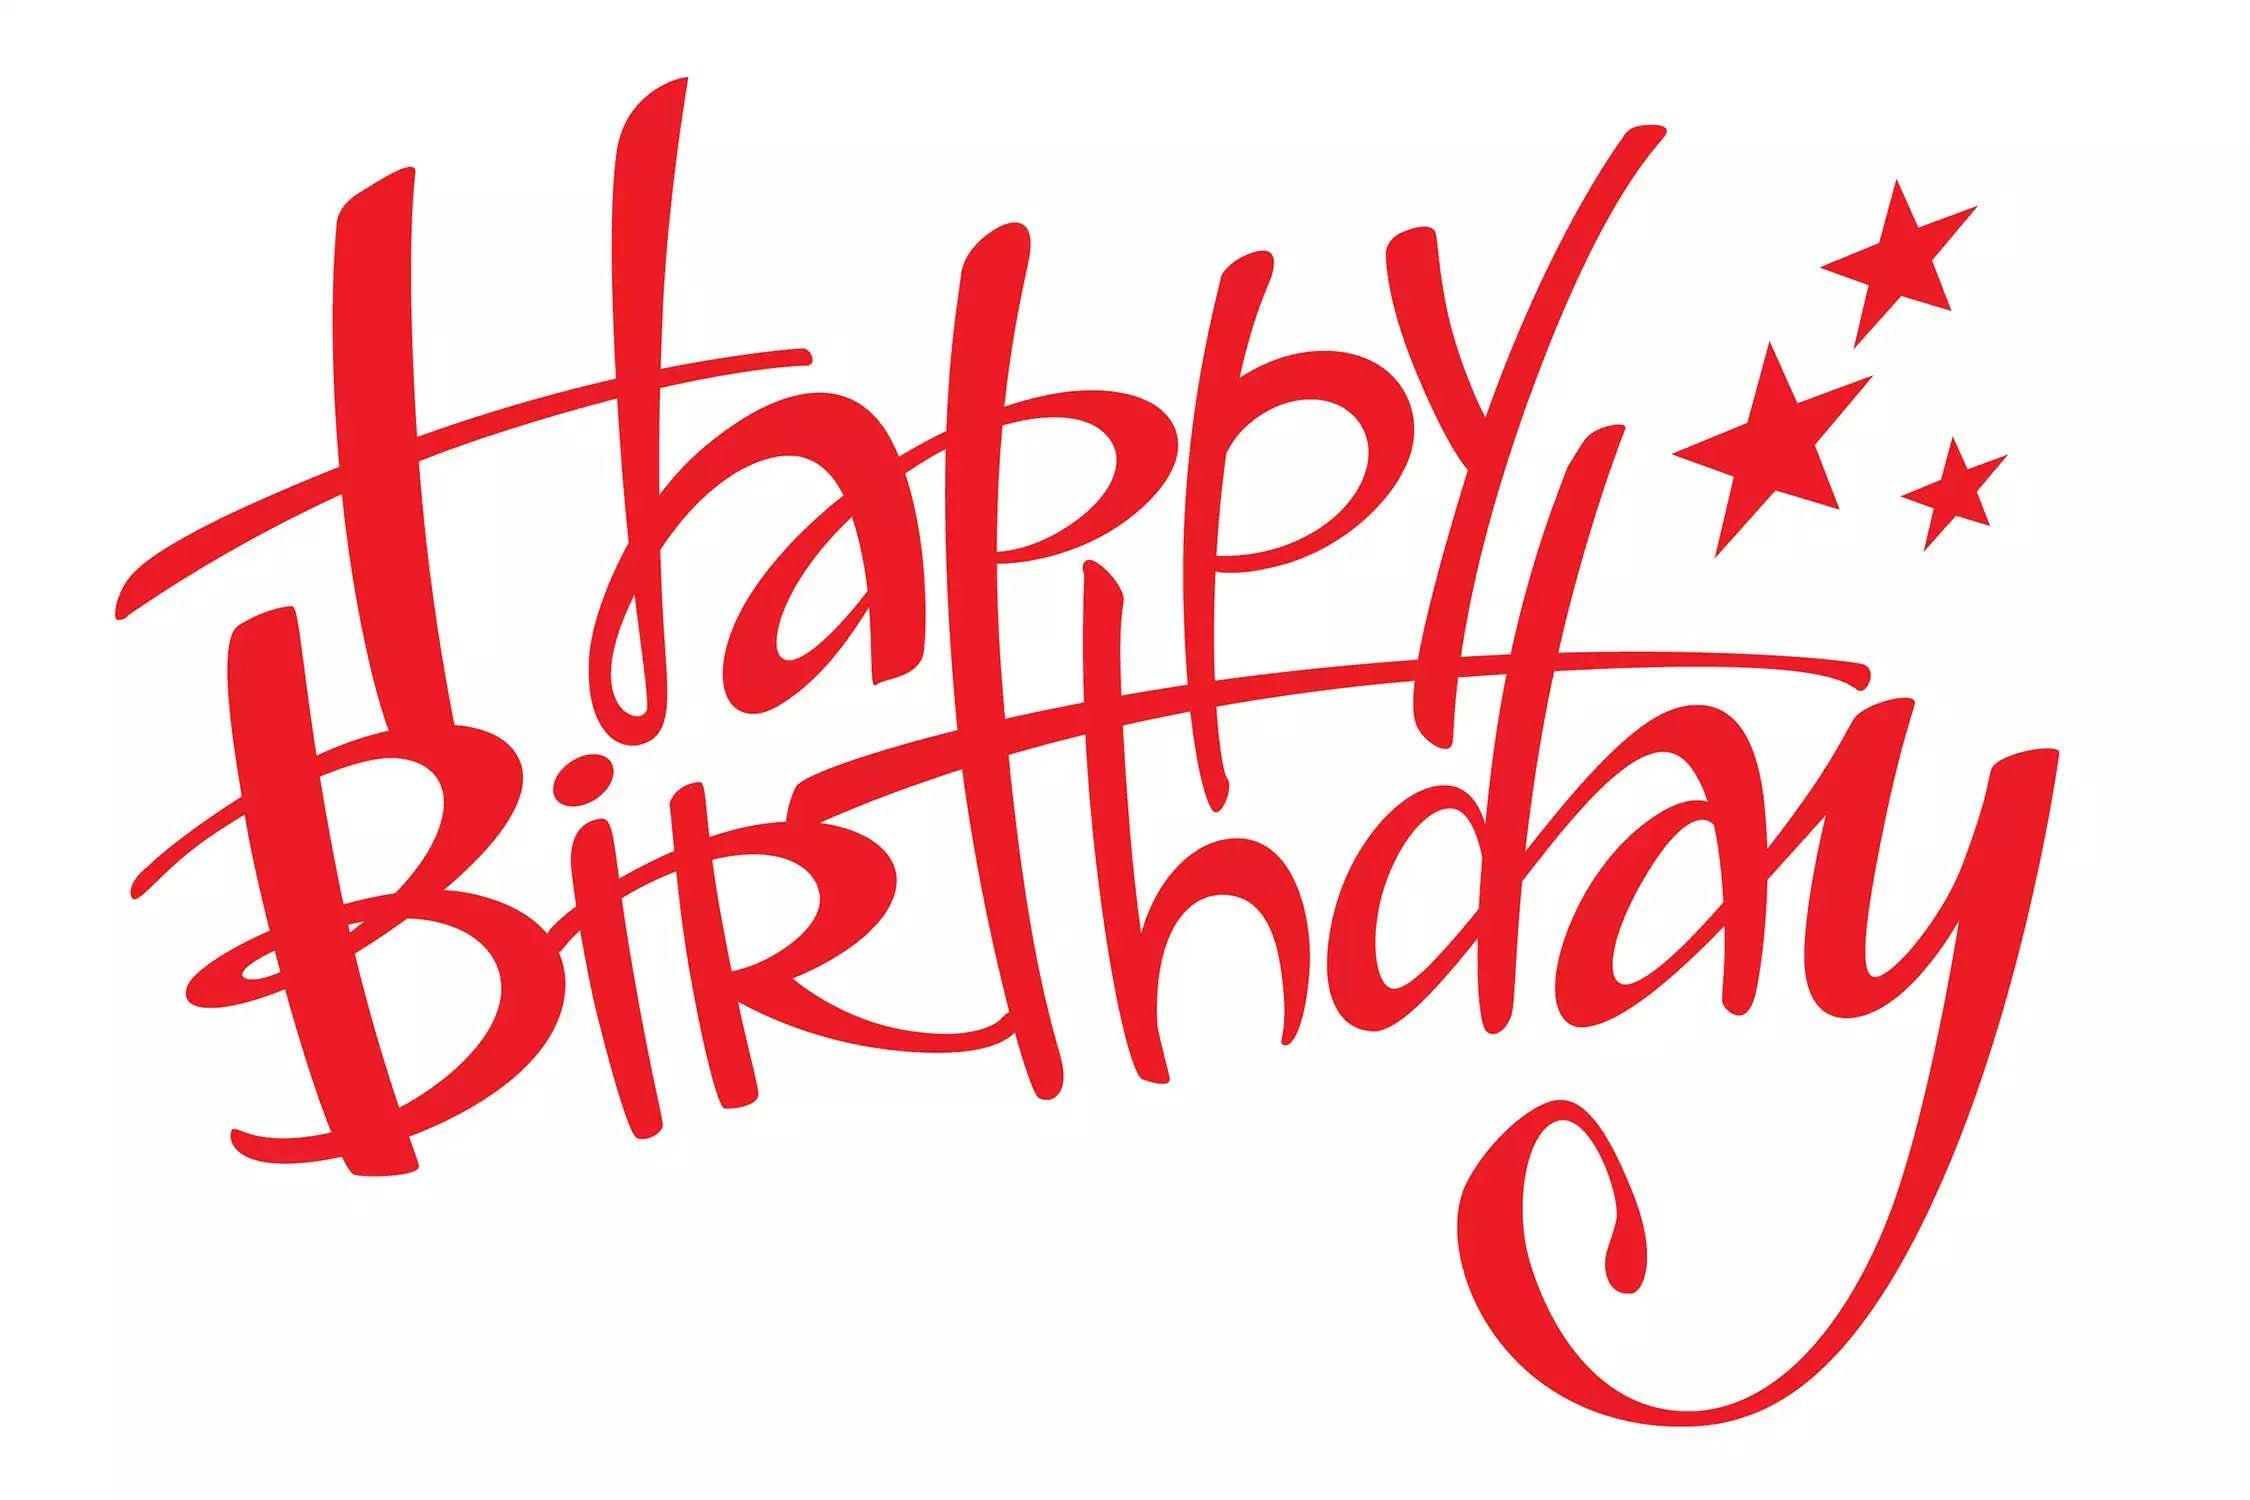 Pin by jeanie torgerson on birthday pinterest birthdays